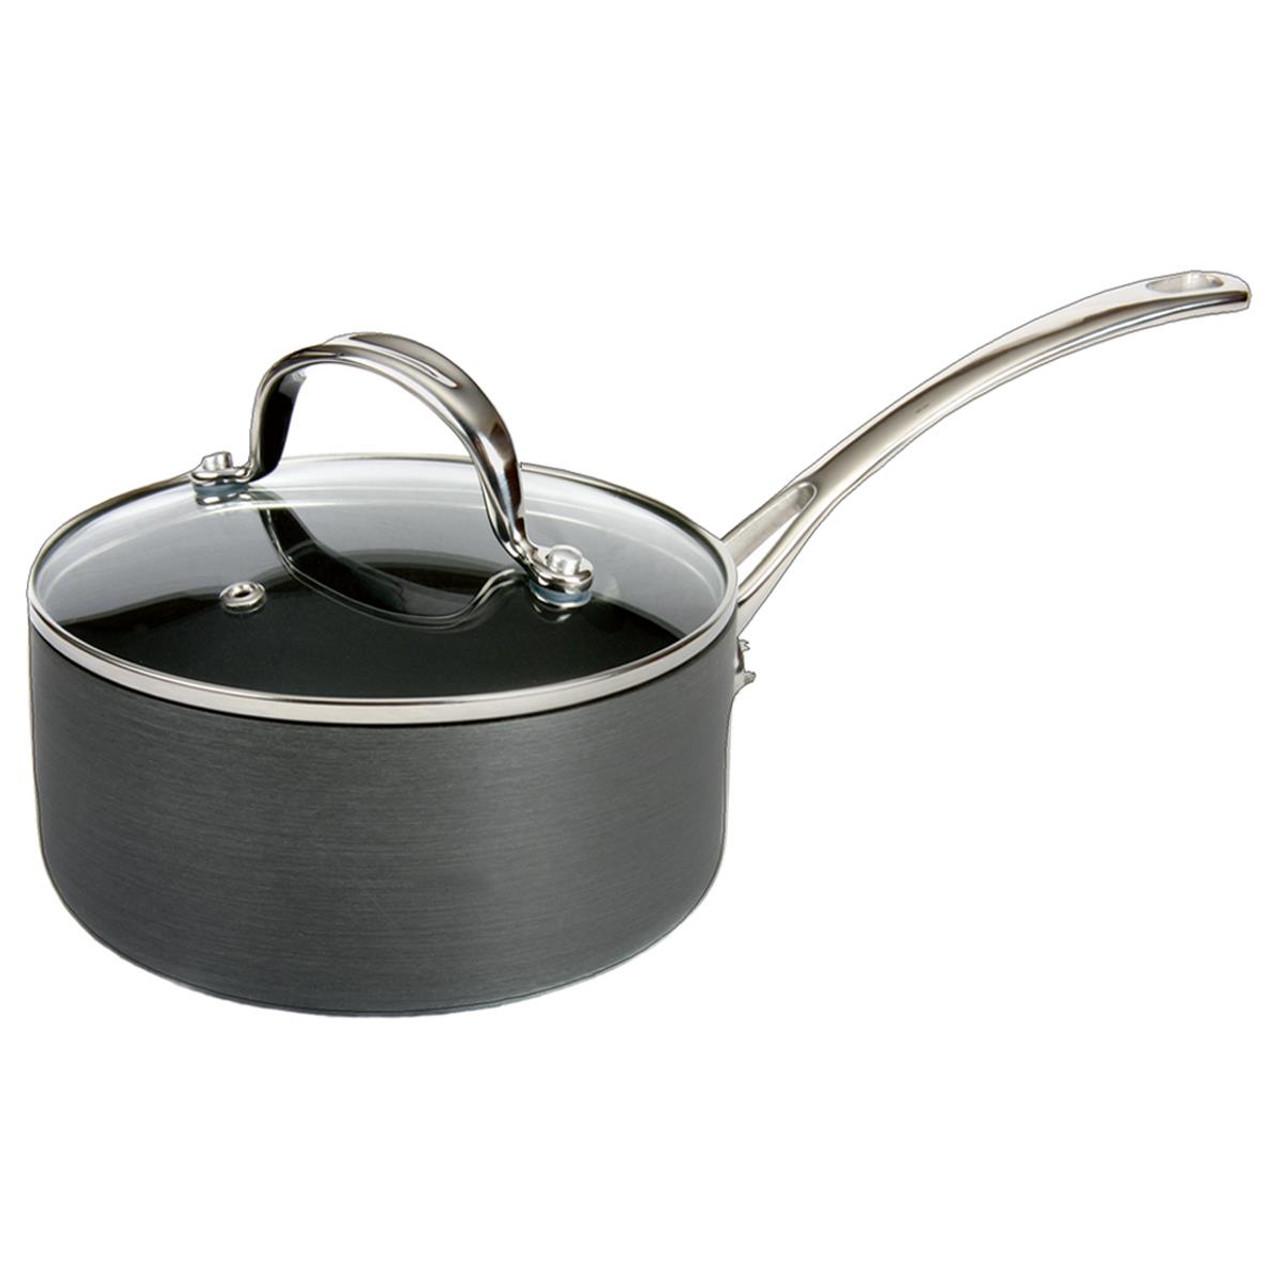 Denby Anodised Saucepan 16cm